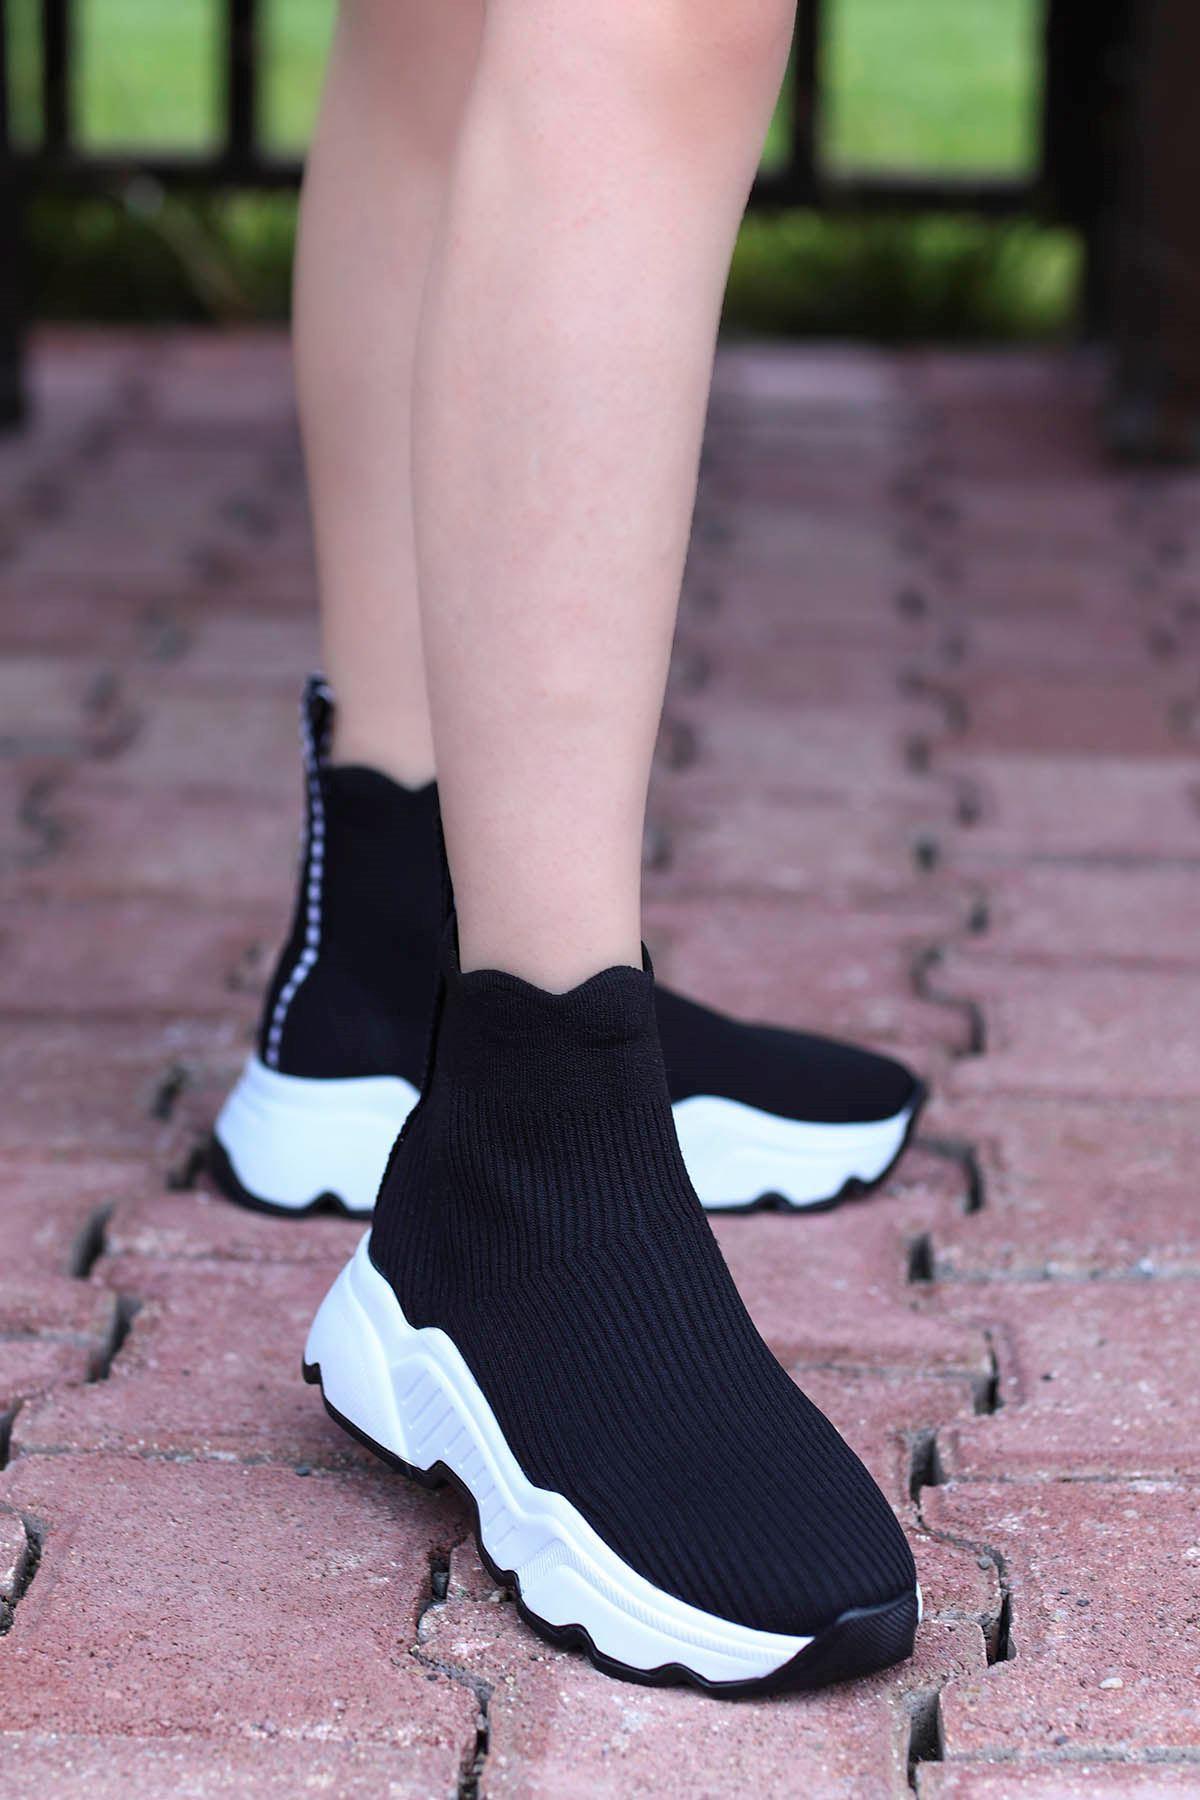 Frm-990 Triko Spor Ayakkabı Siyah